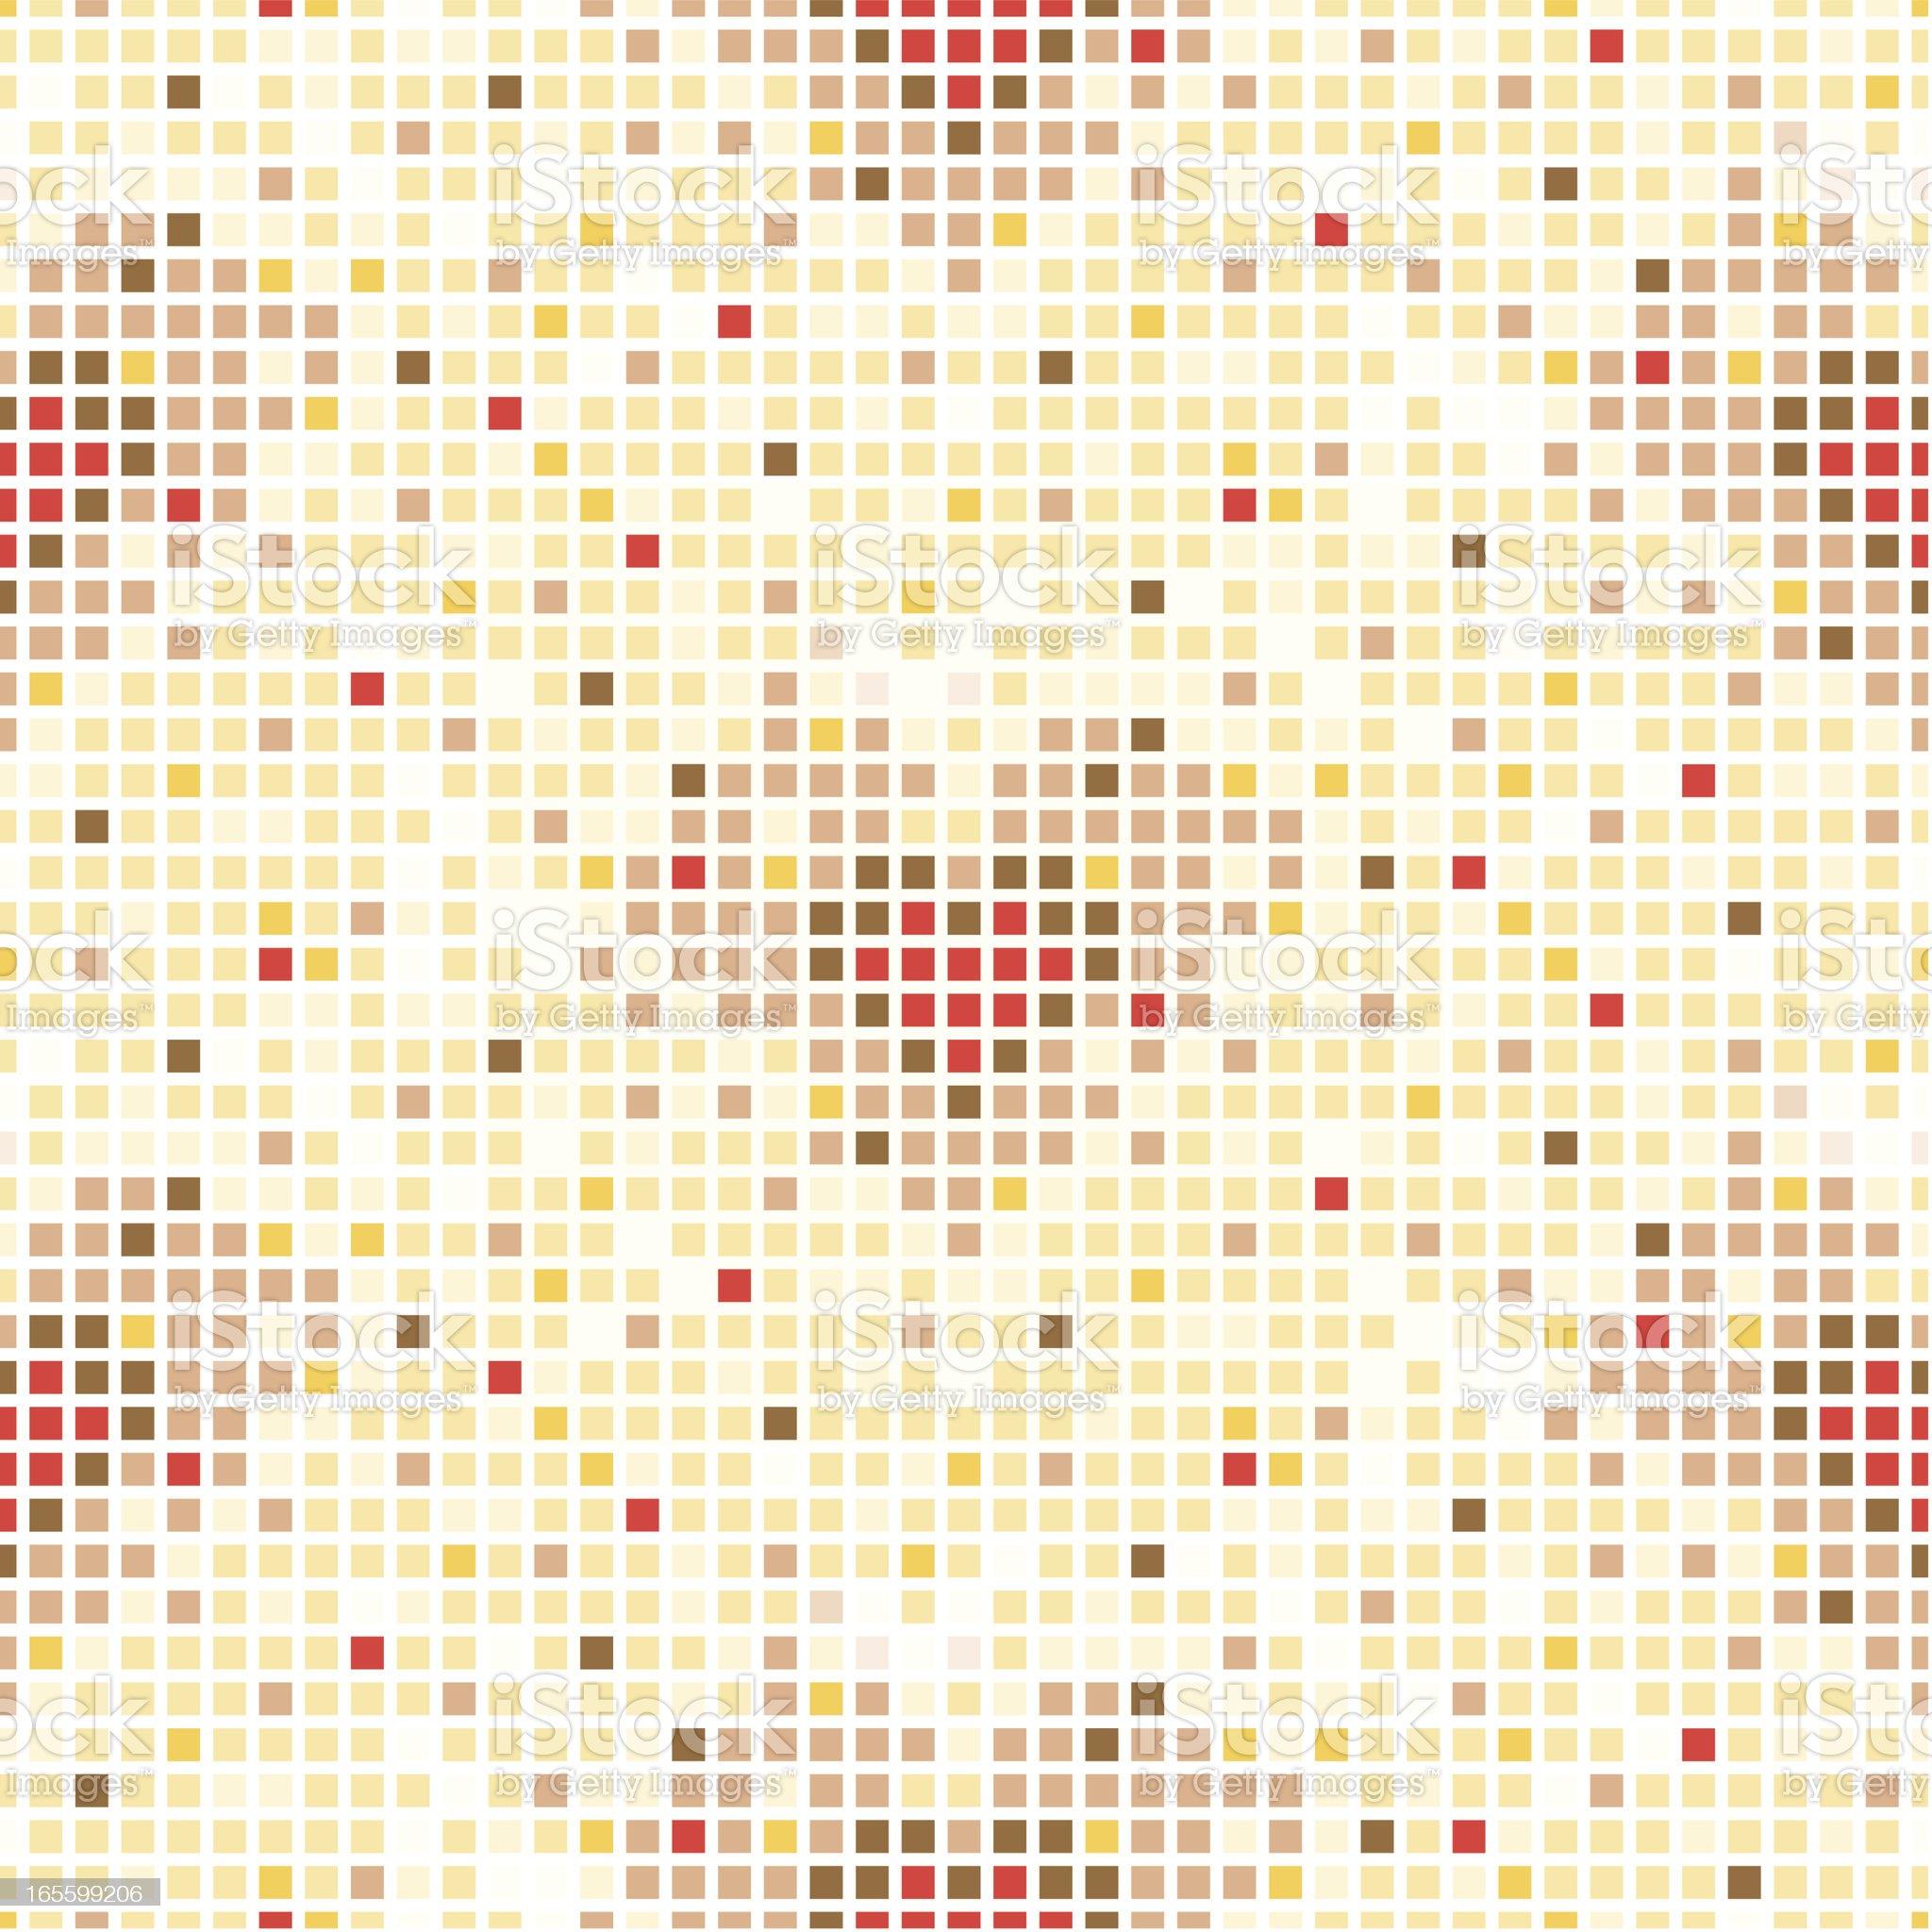 Gold Heart Tile royalty-free stock vector art